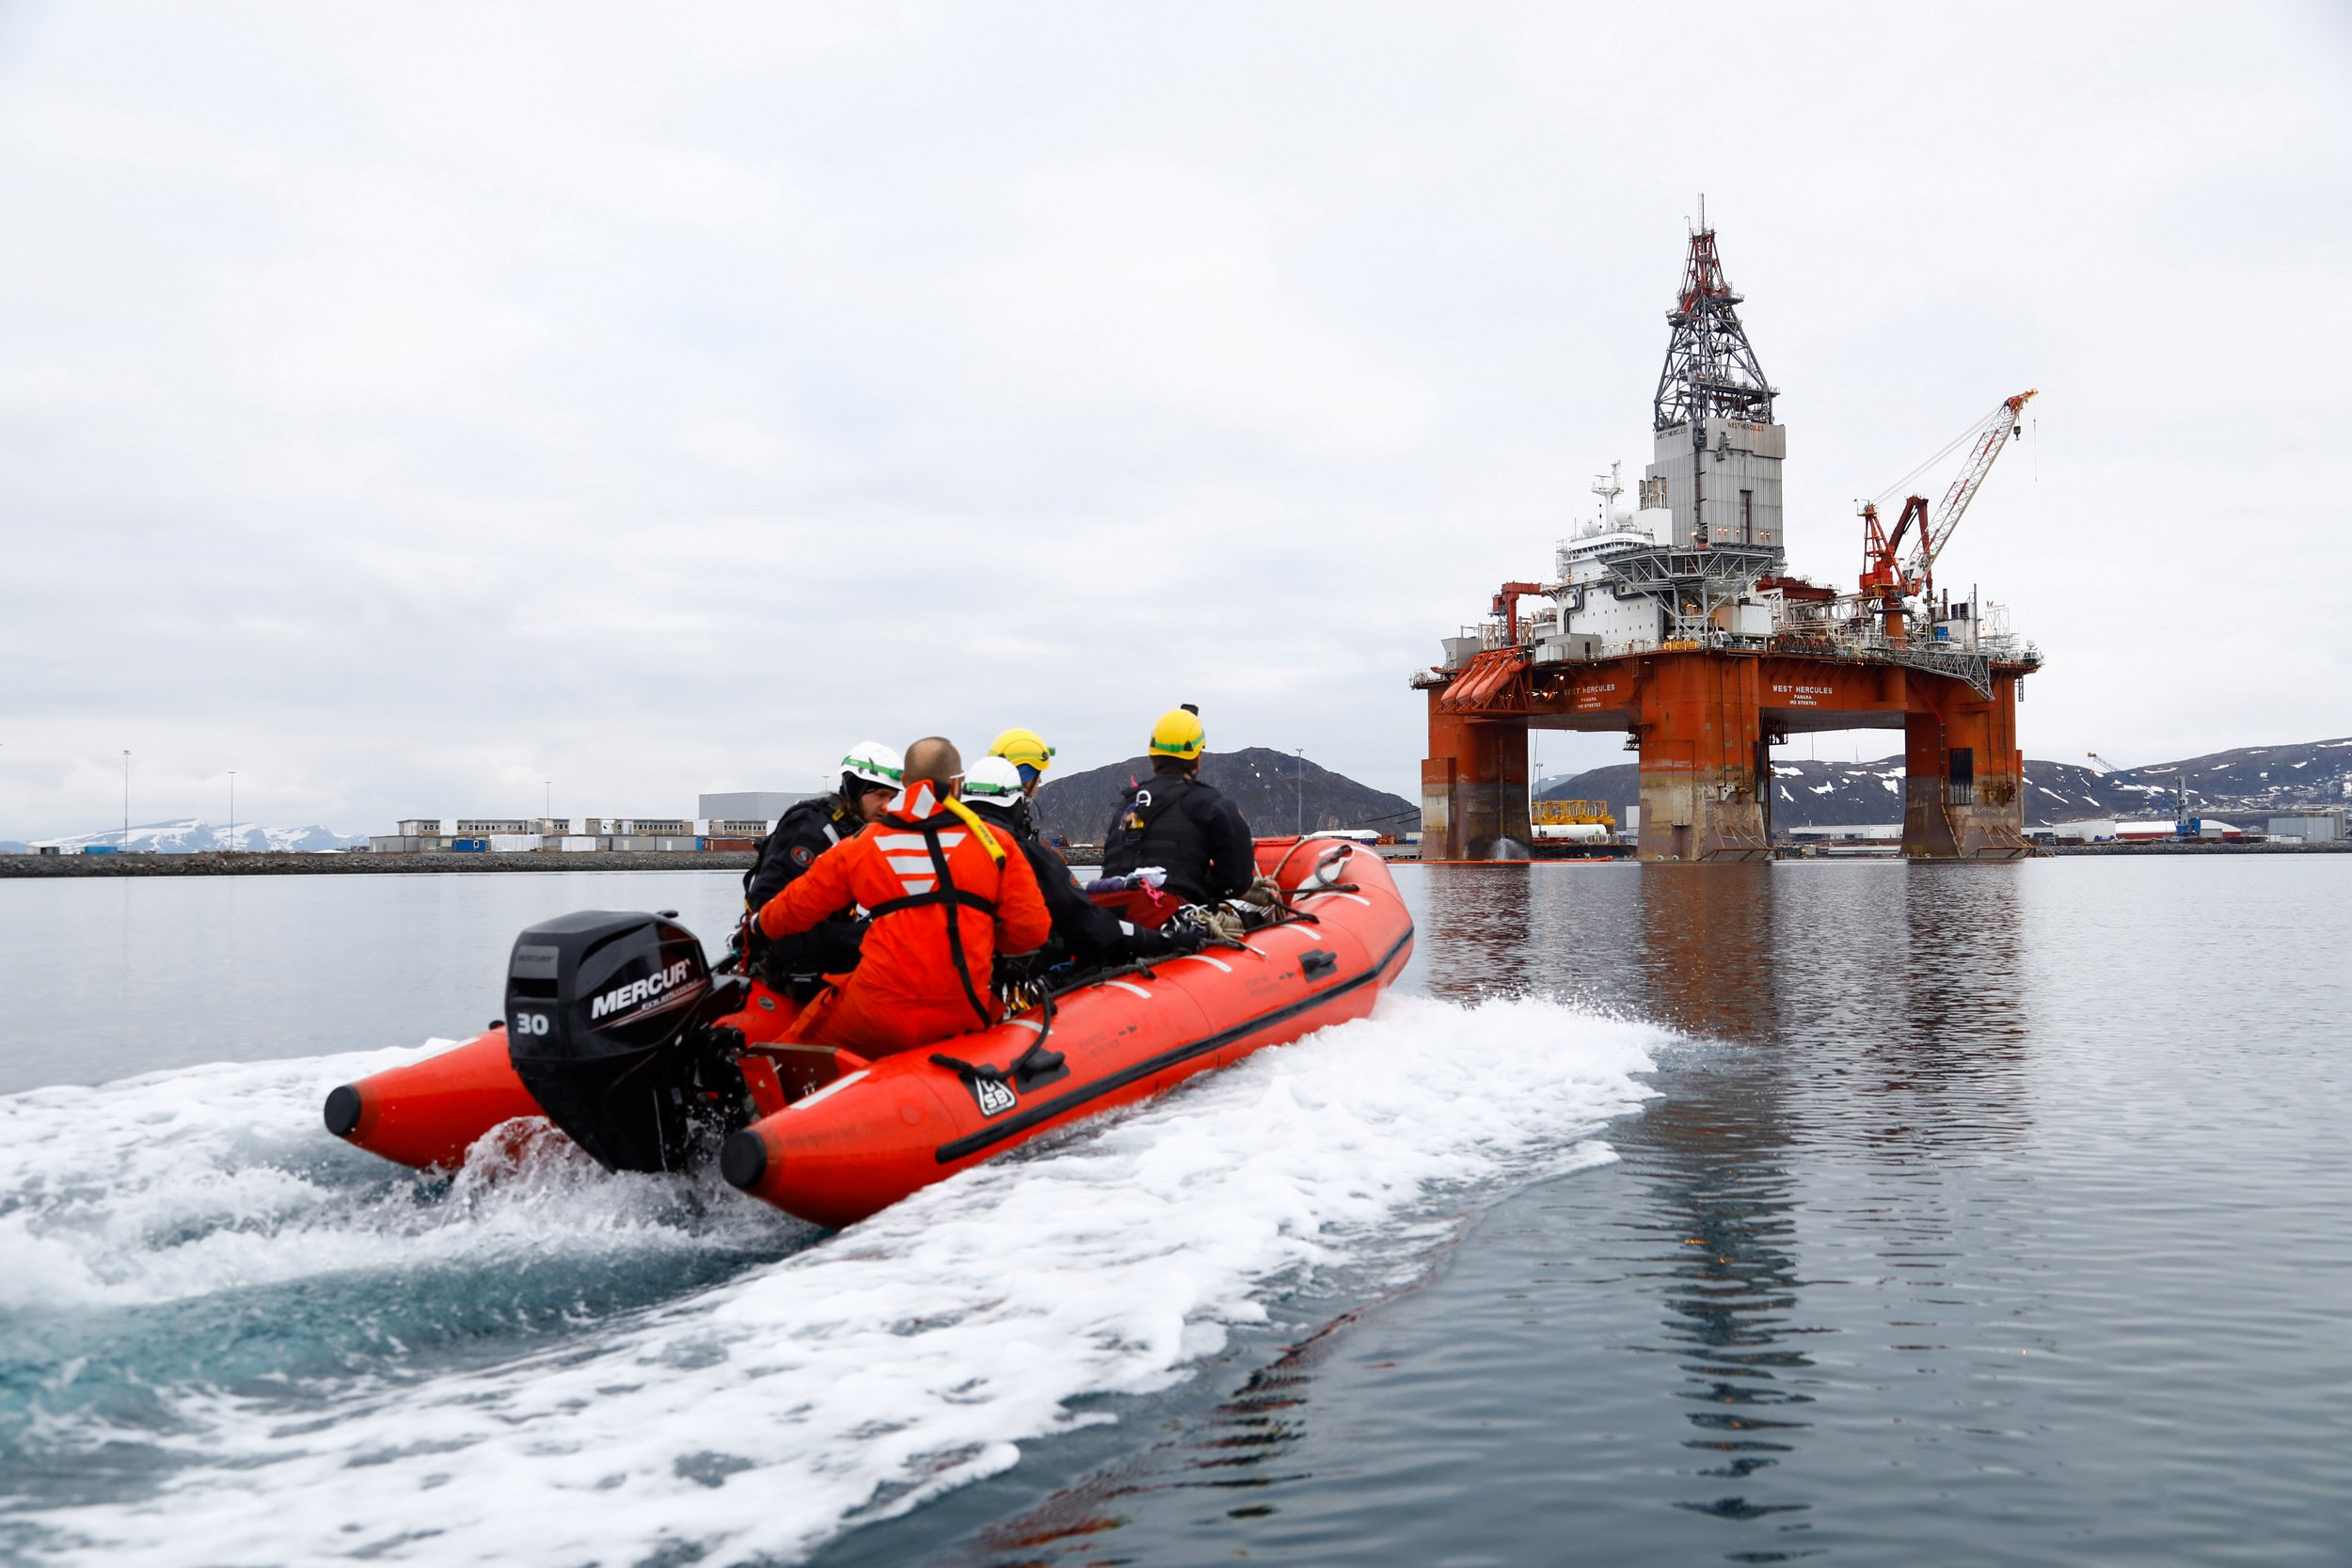 Greenpeace activists approach Equinor oil rig near Hammerfest, Norway, April 29, 2019. Jonne Sippola/Greenpeace/Handout via REUTERS